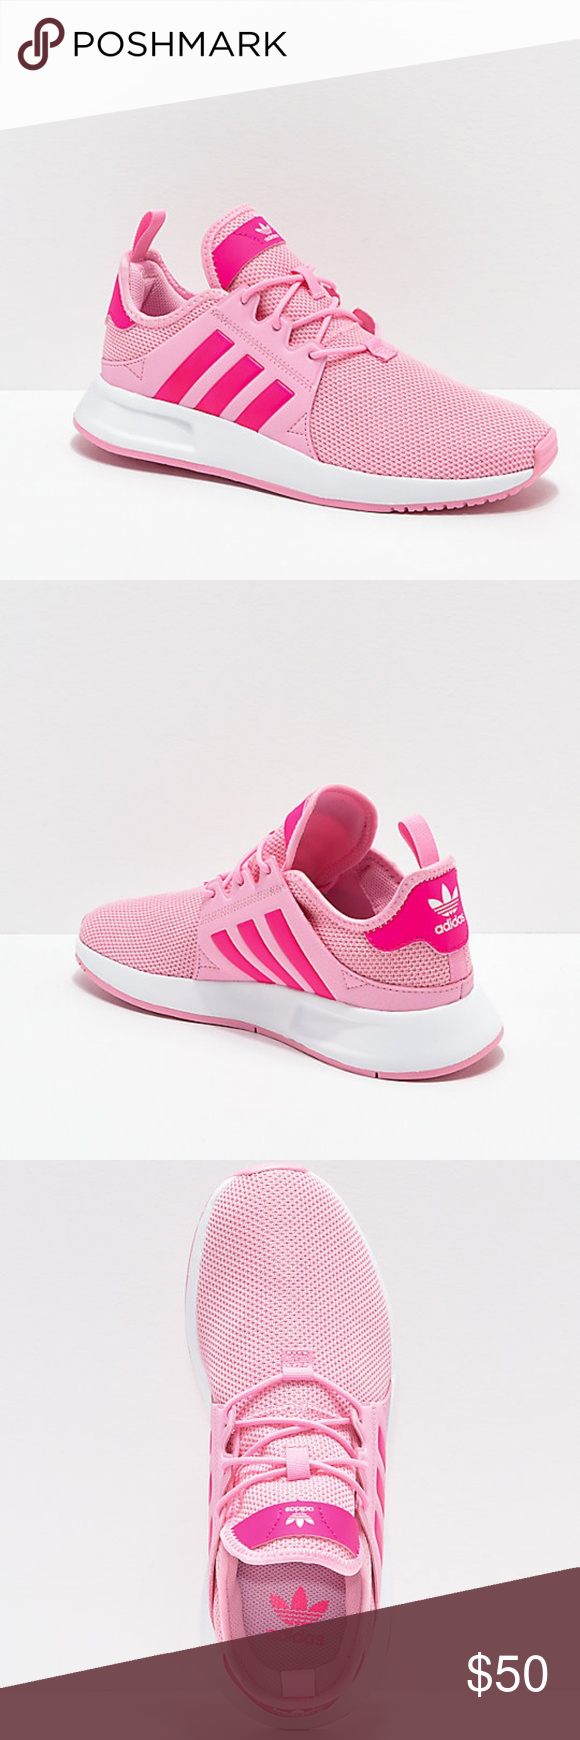 adidas Xplorer Pink \u0026 White Shoes